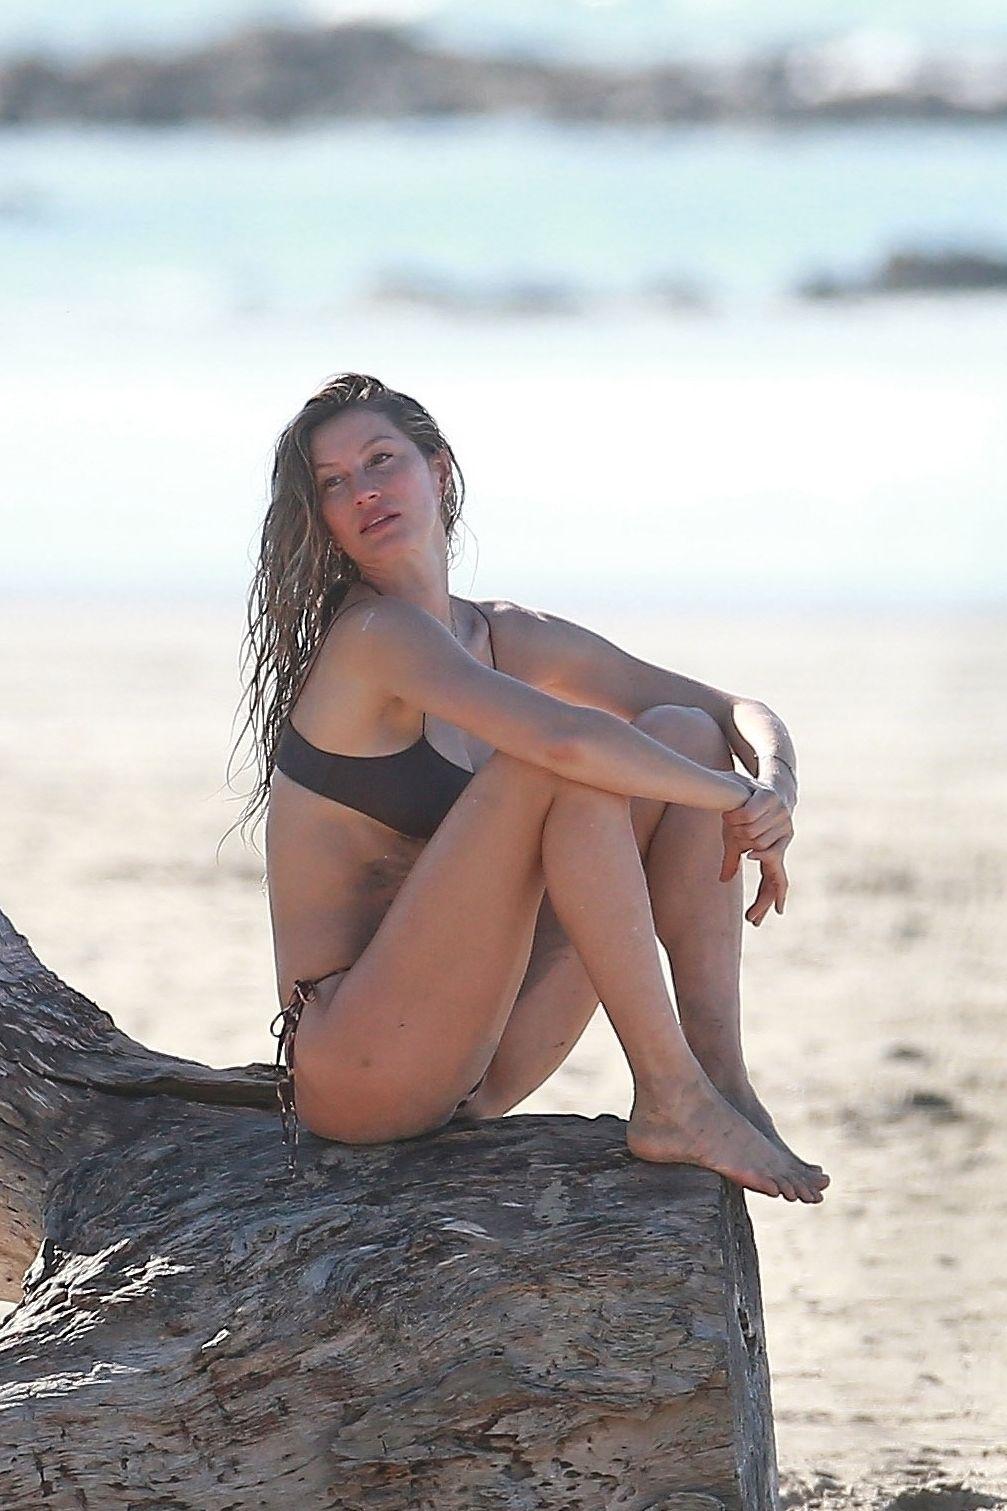 Gisele Bundchen Puts Her Incredible Bikini Body On Display During A Beach Photoshoot 0005